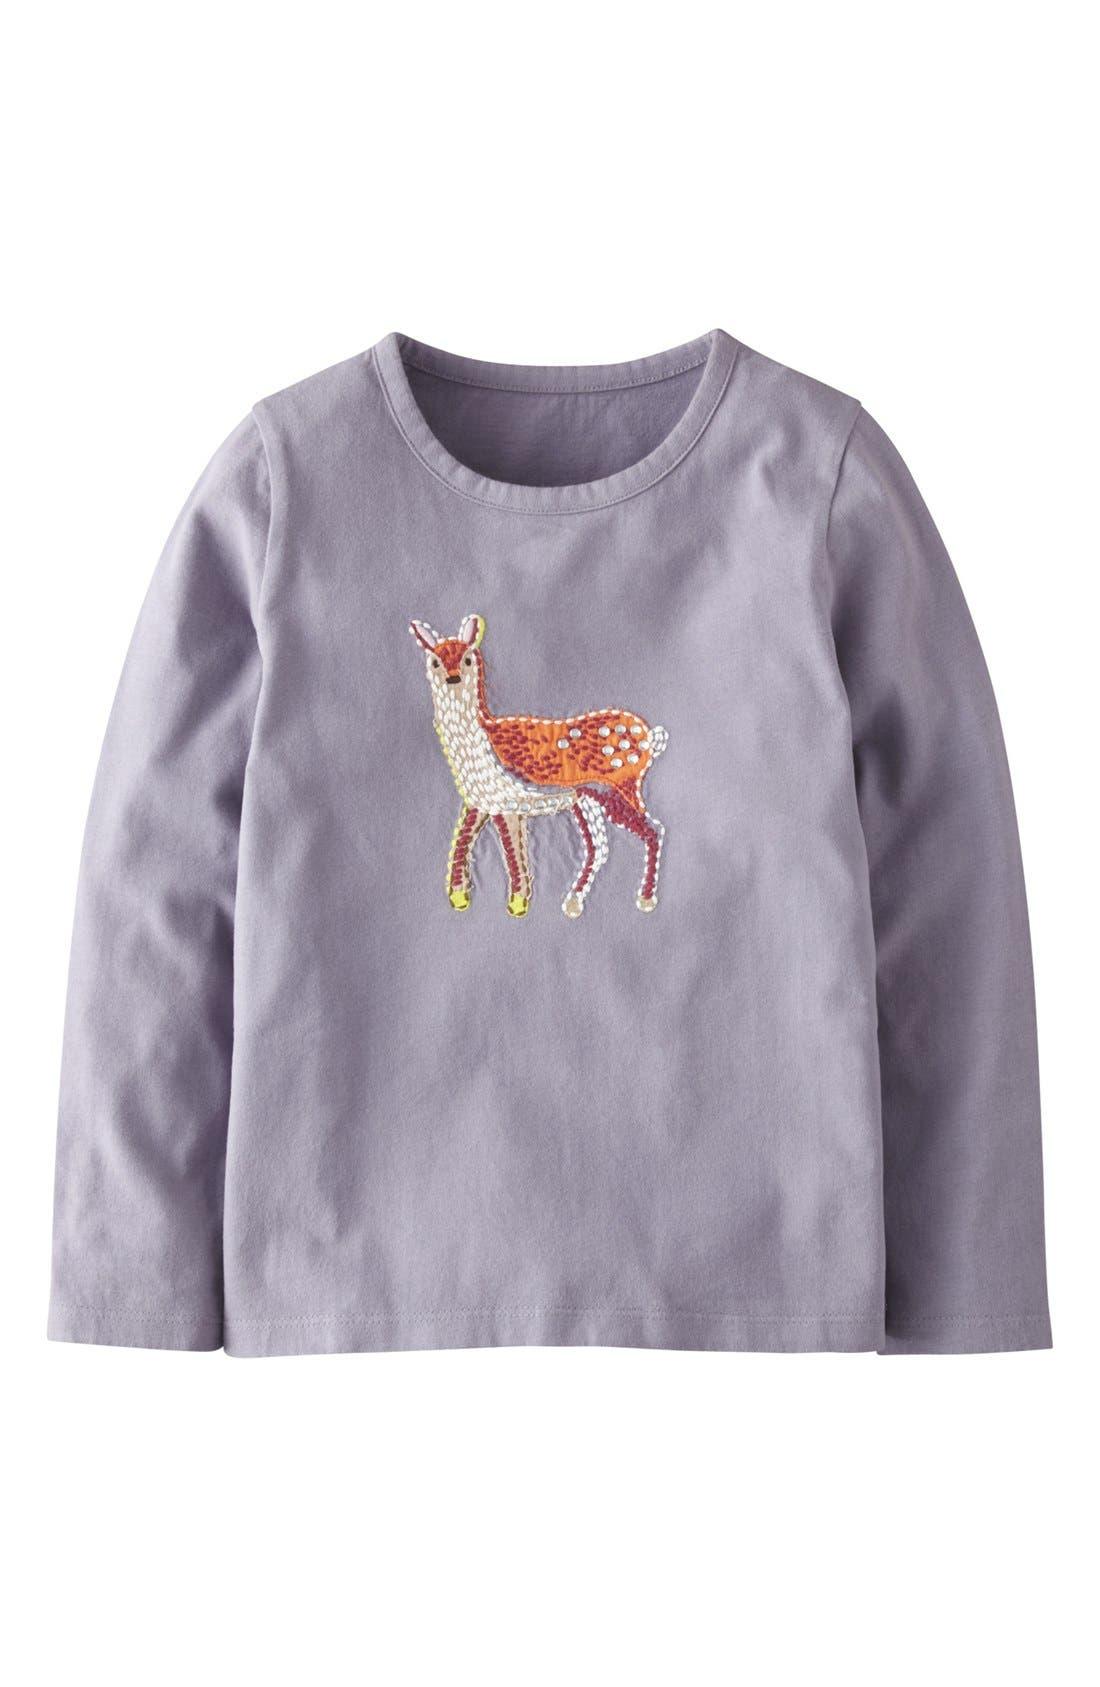 Alternate Image 1 Selected - Mini Boden 'Woodland' Appliqué Long Sleeve Tee (Toddler Girls, Little Girls & Big Girls)